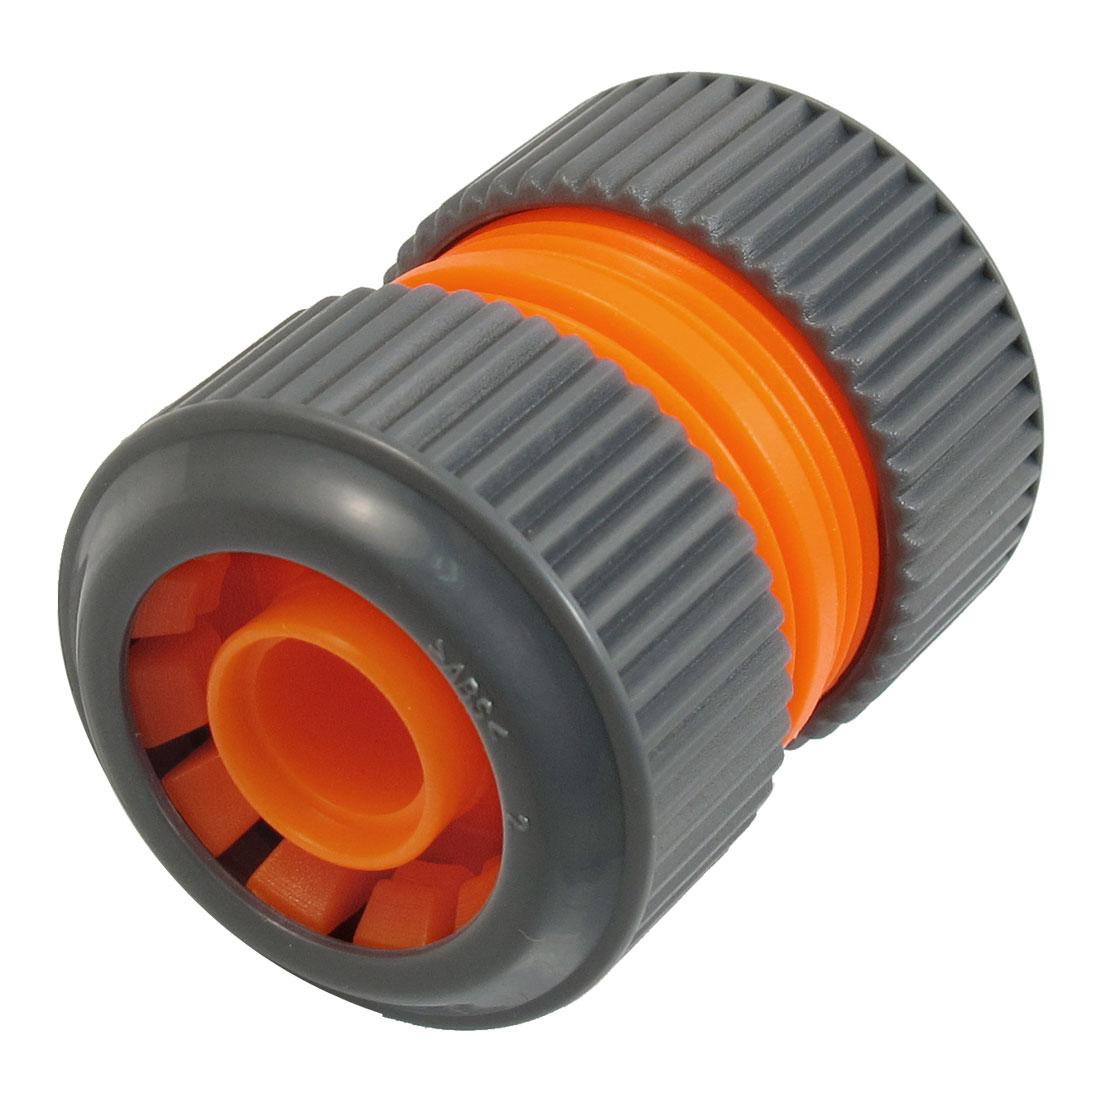 Unique Bargains Gray Orange Quick Connector Disconnect Coupler for 16mm x 24mm Water Hose